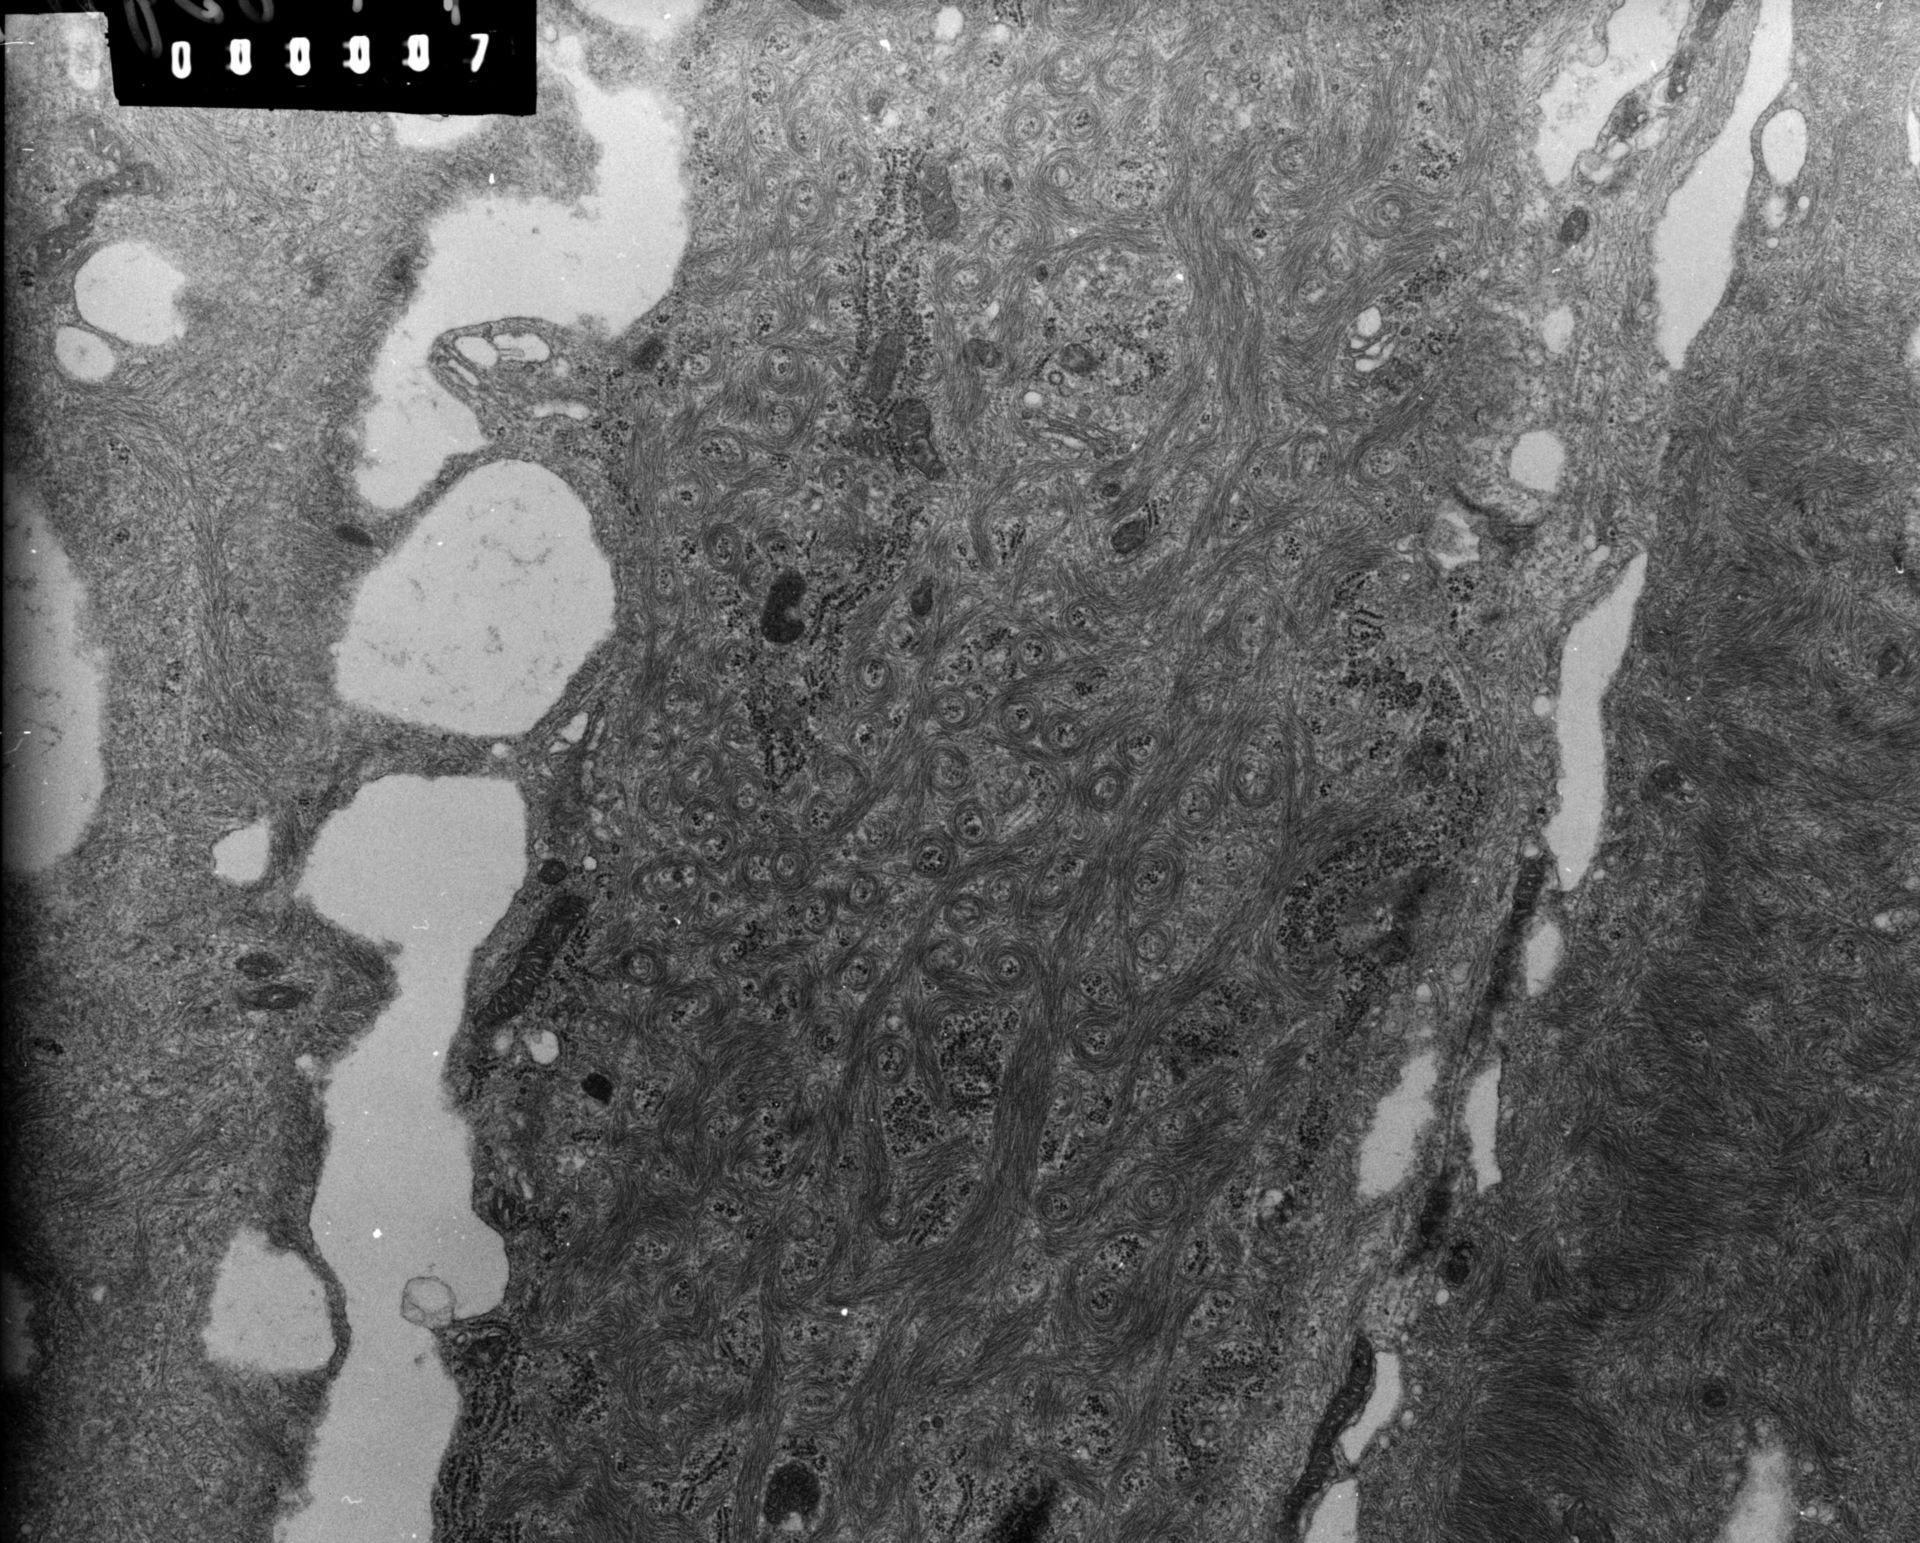 Rana catesbeiana (Plasma membrane) - CIL:9301